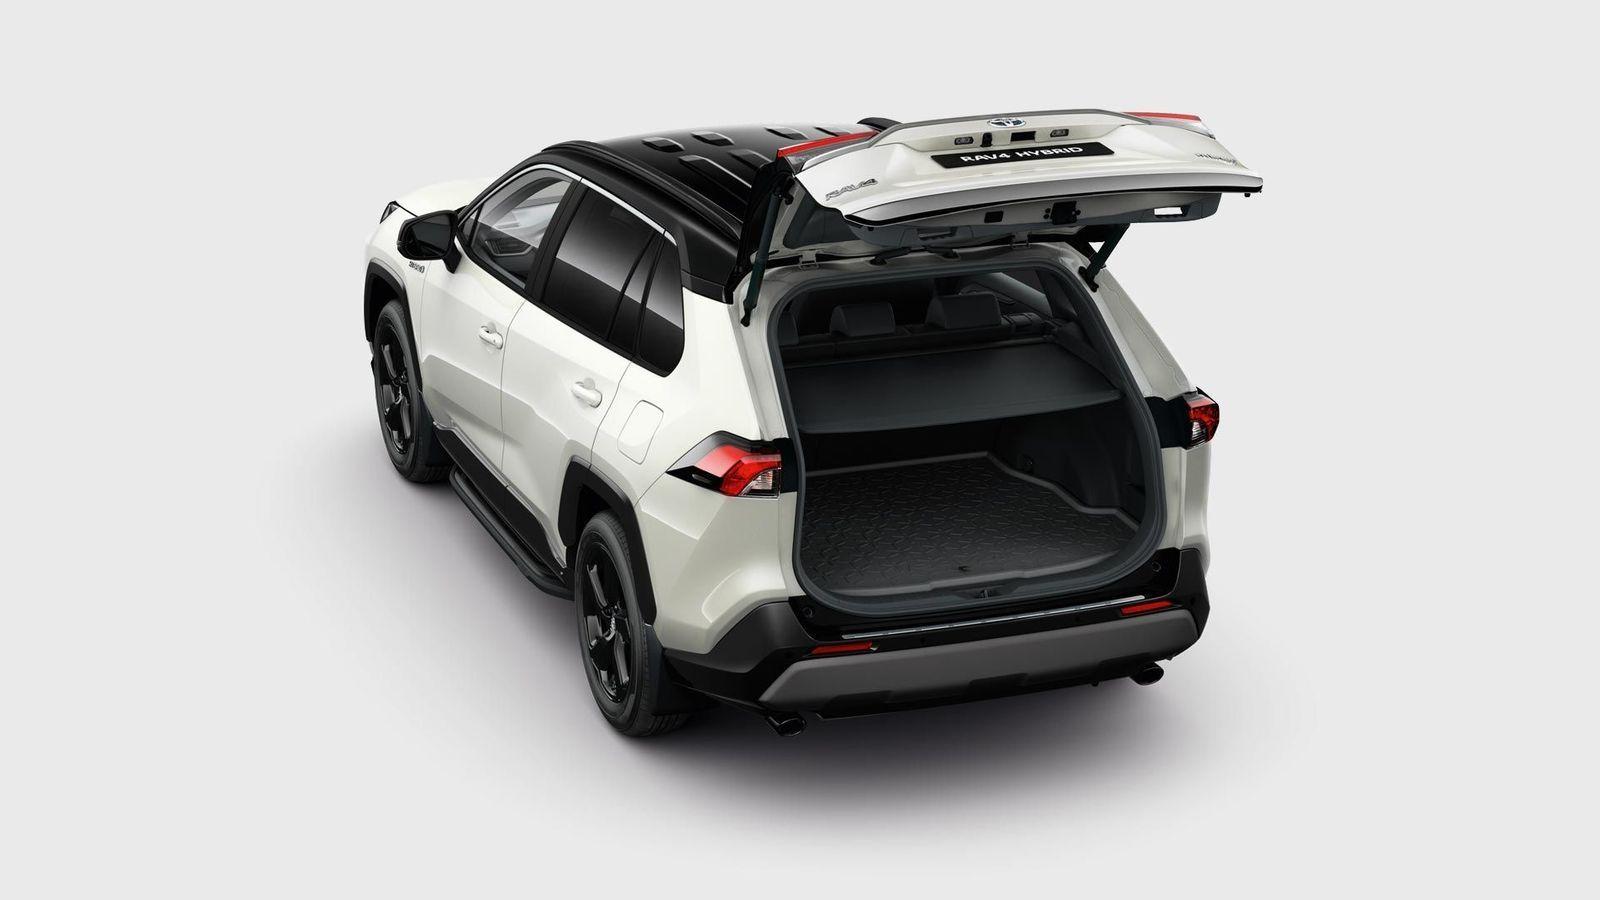 Toyota Rav4 Hybrid Check More At Http Www Autocar1 Club 2019 06